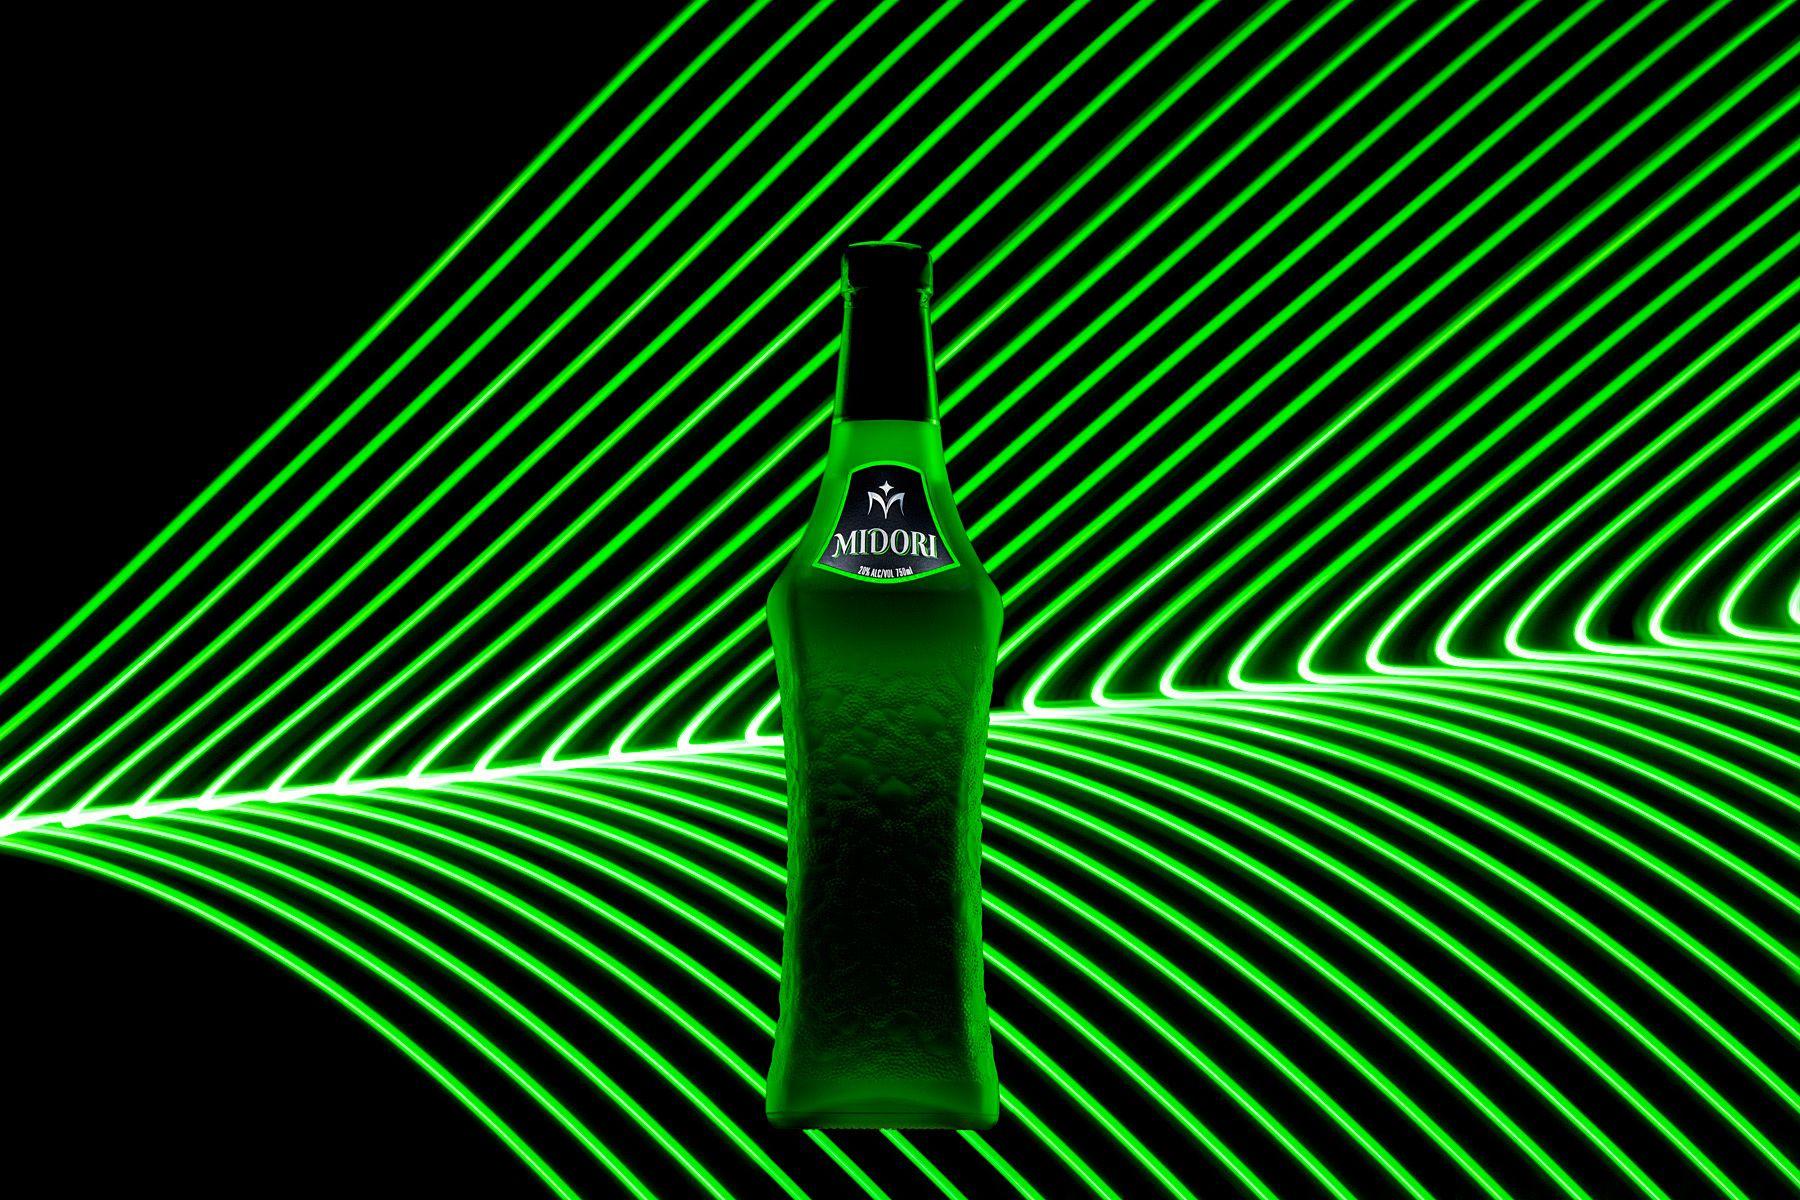 1brian_demello_photography_advertising_product_food_liquids_beverage_portrait_beauty_0308_ml_019_copy.jpg